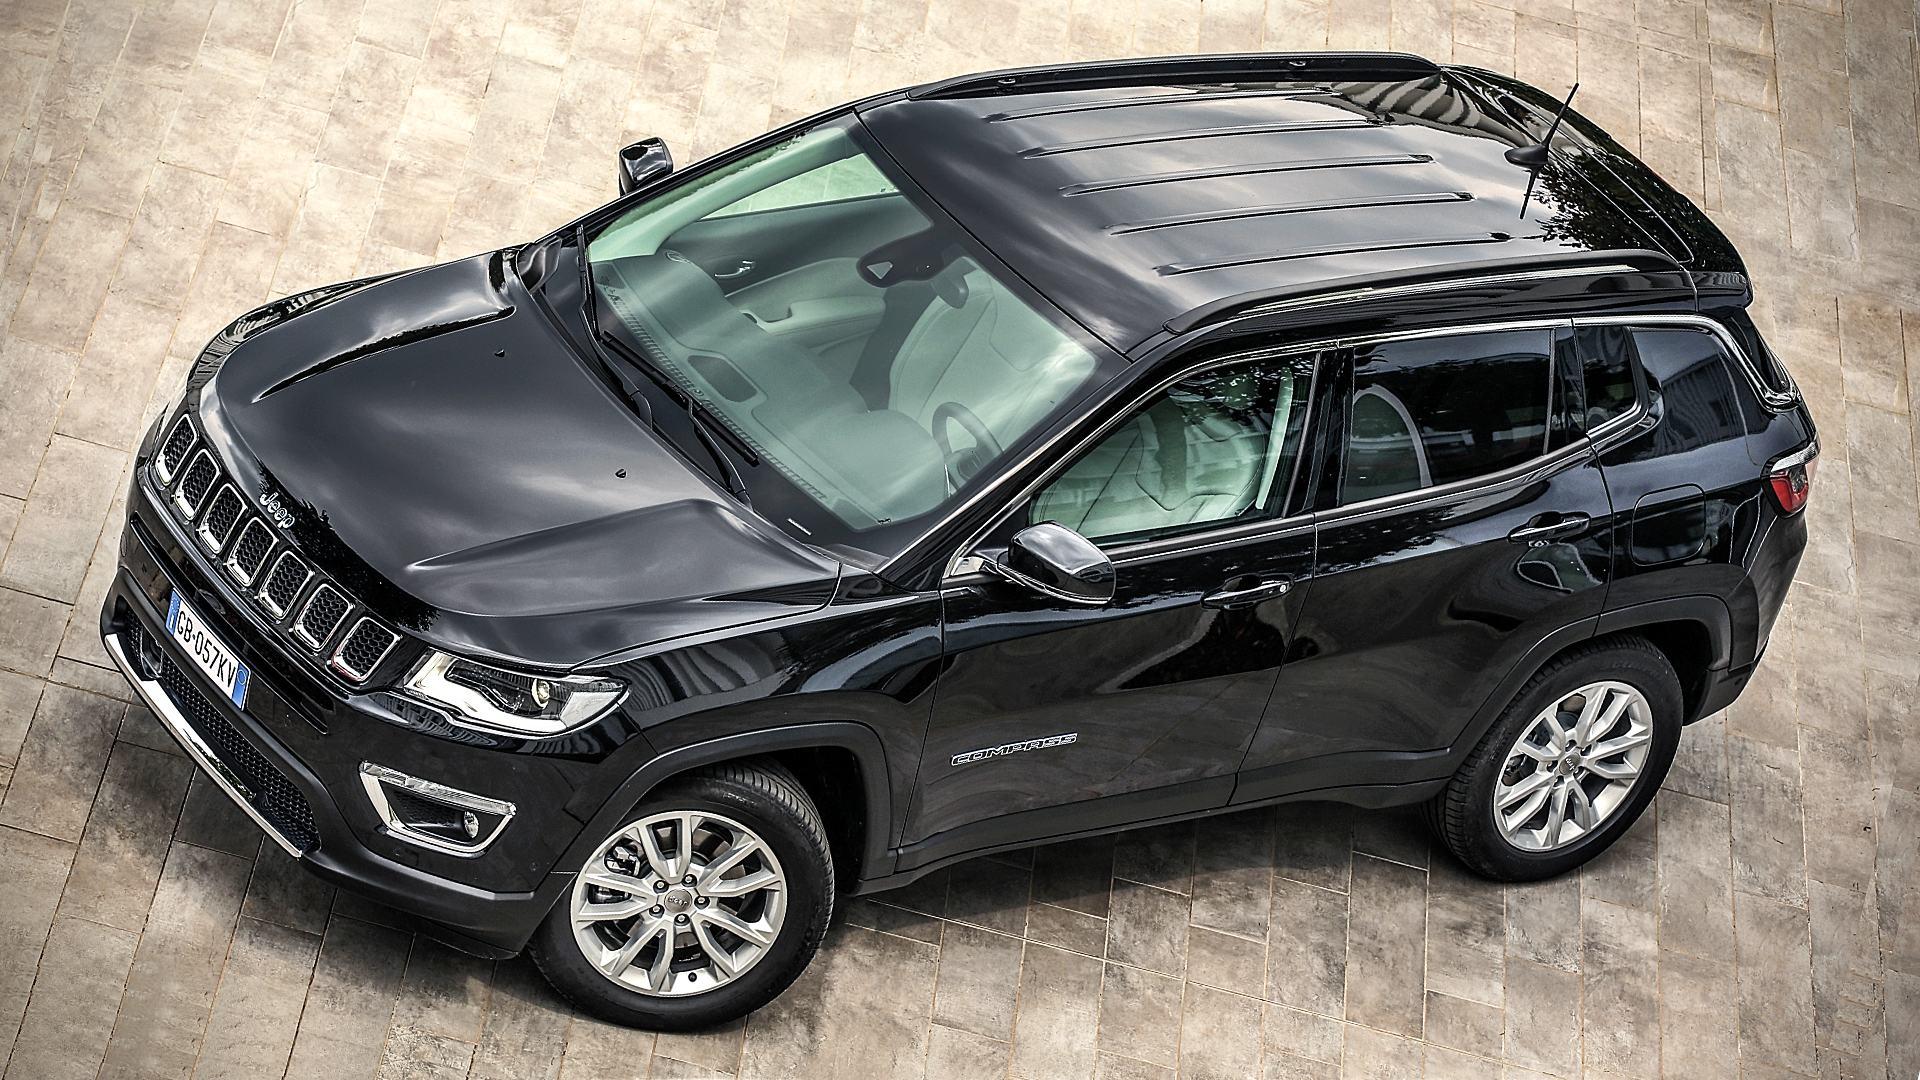 2021 Jeep Compass Limited Hybrid SUV